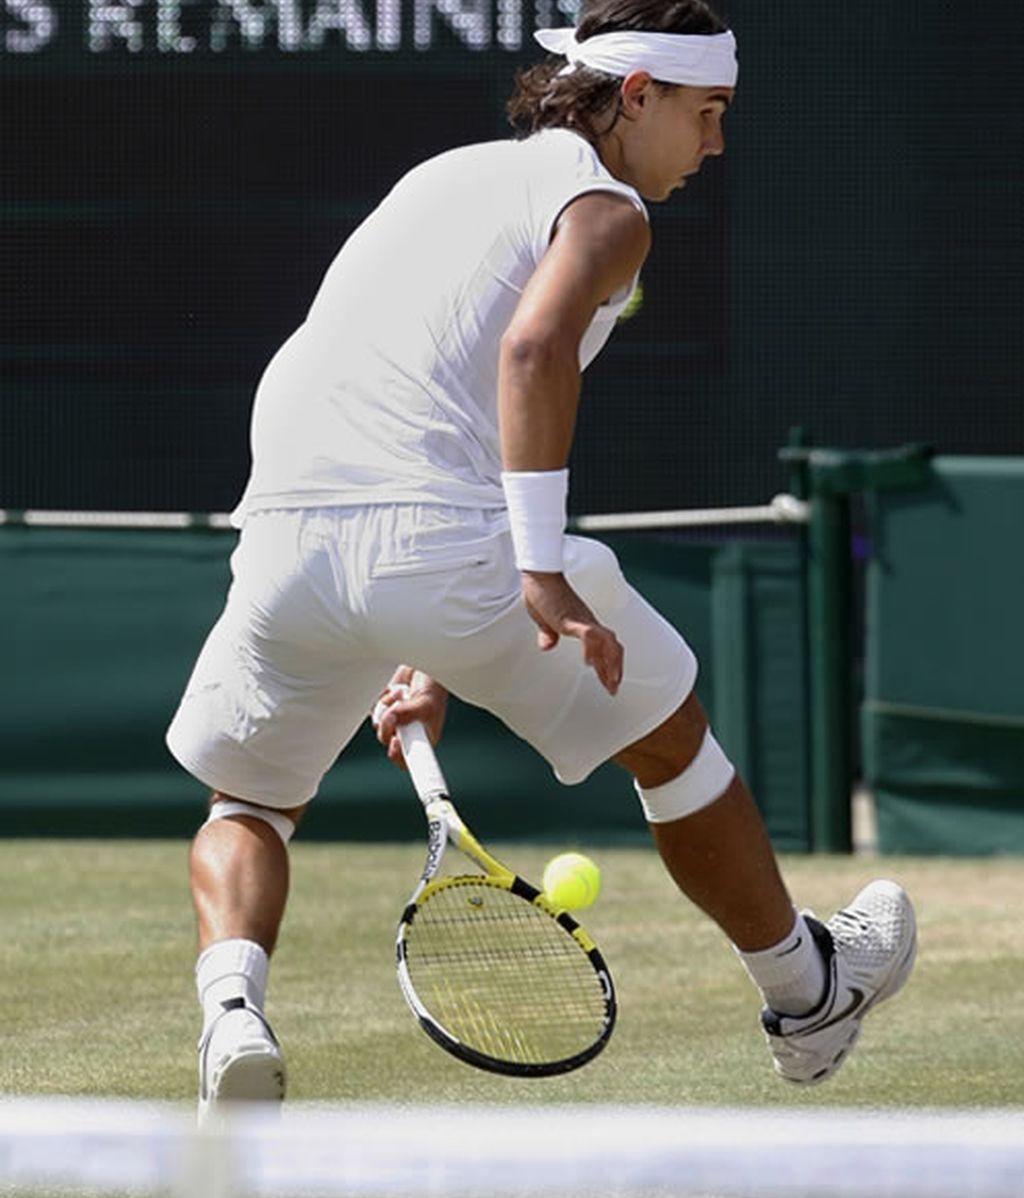 Los espectaculares golpes de raqueta de Rafa Nadal